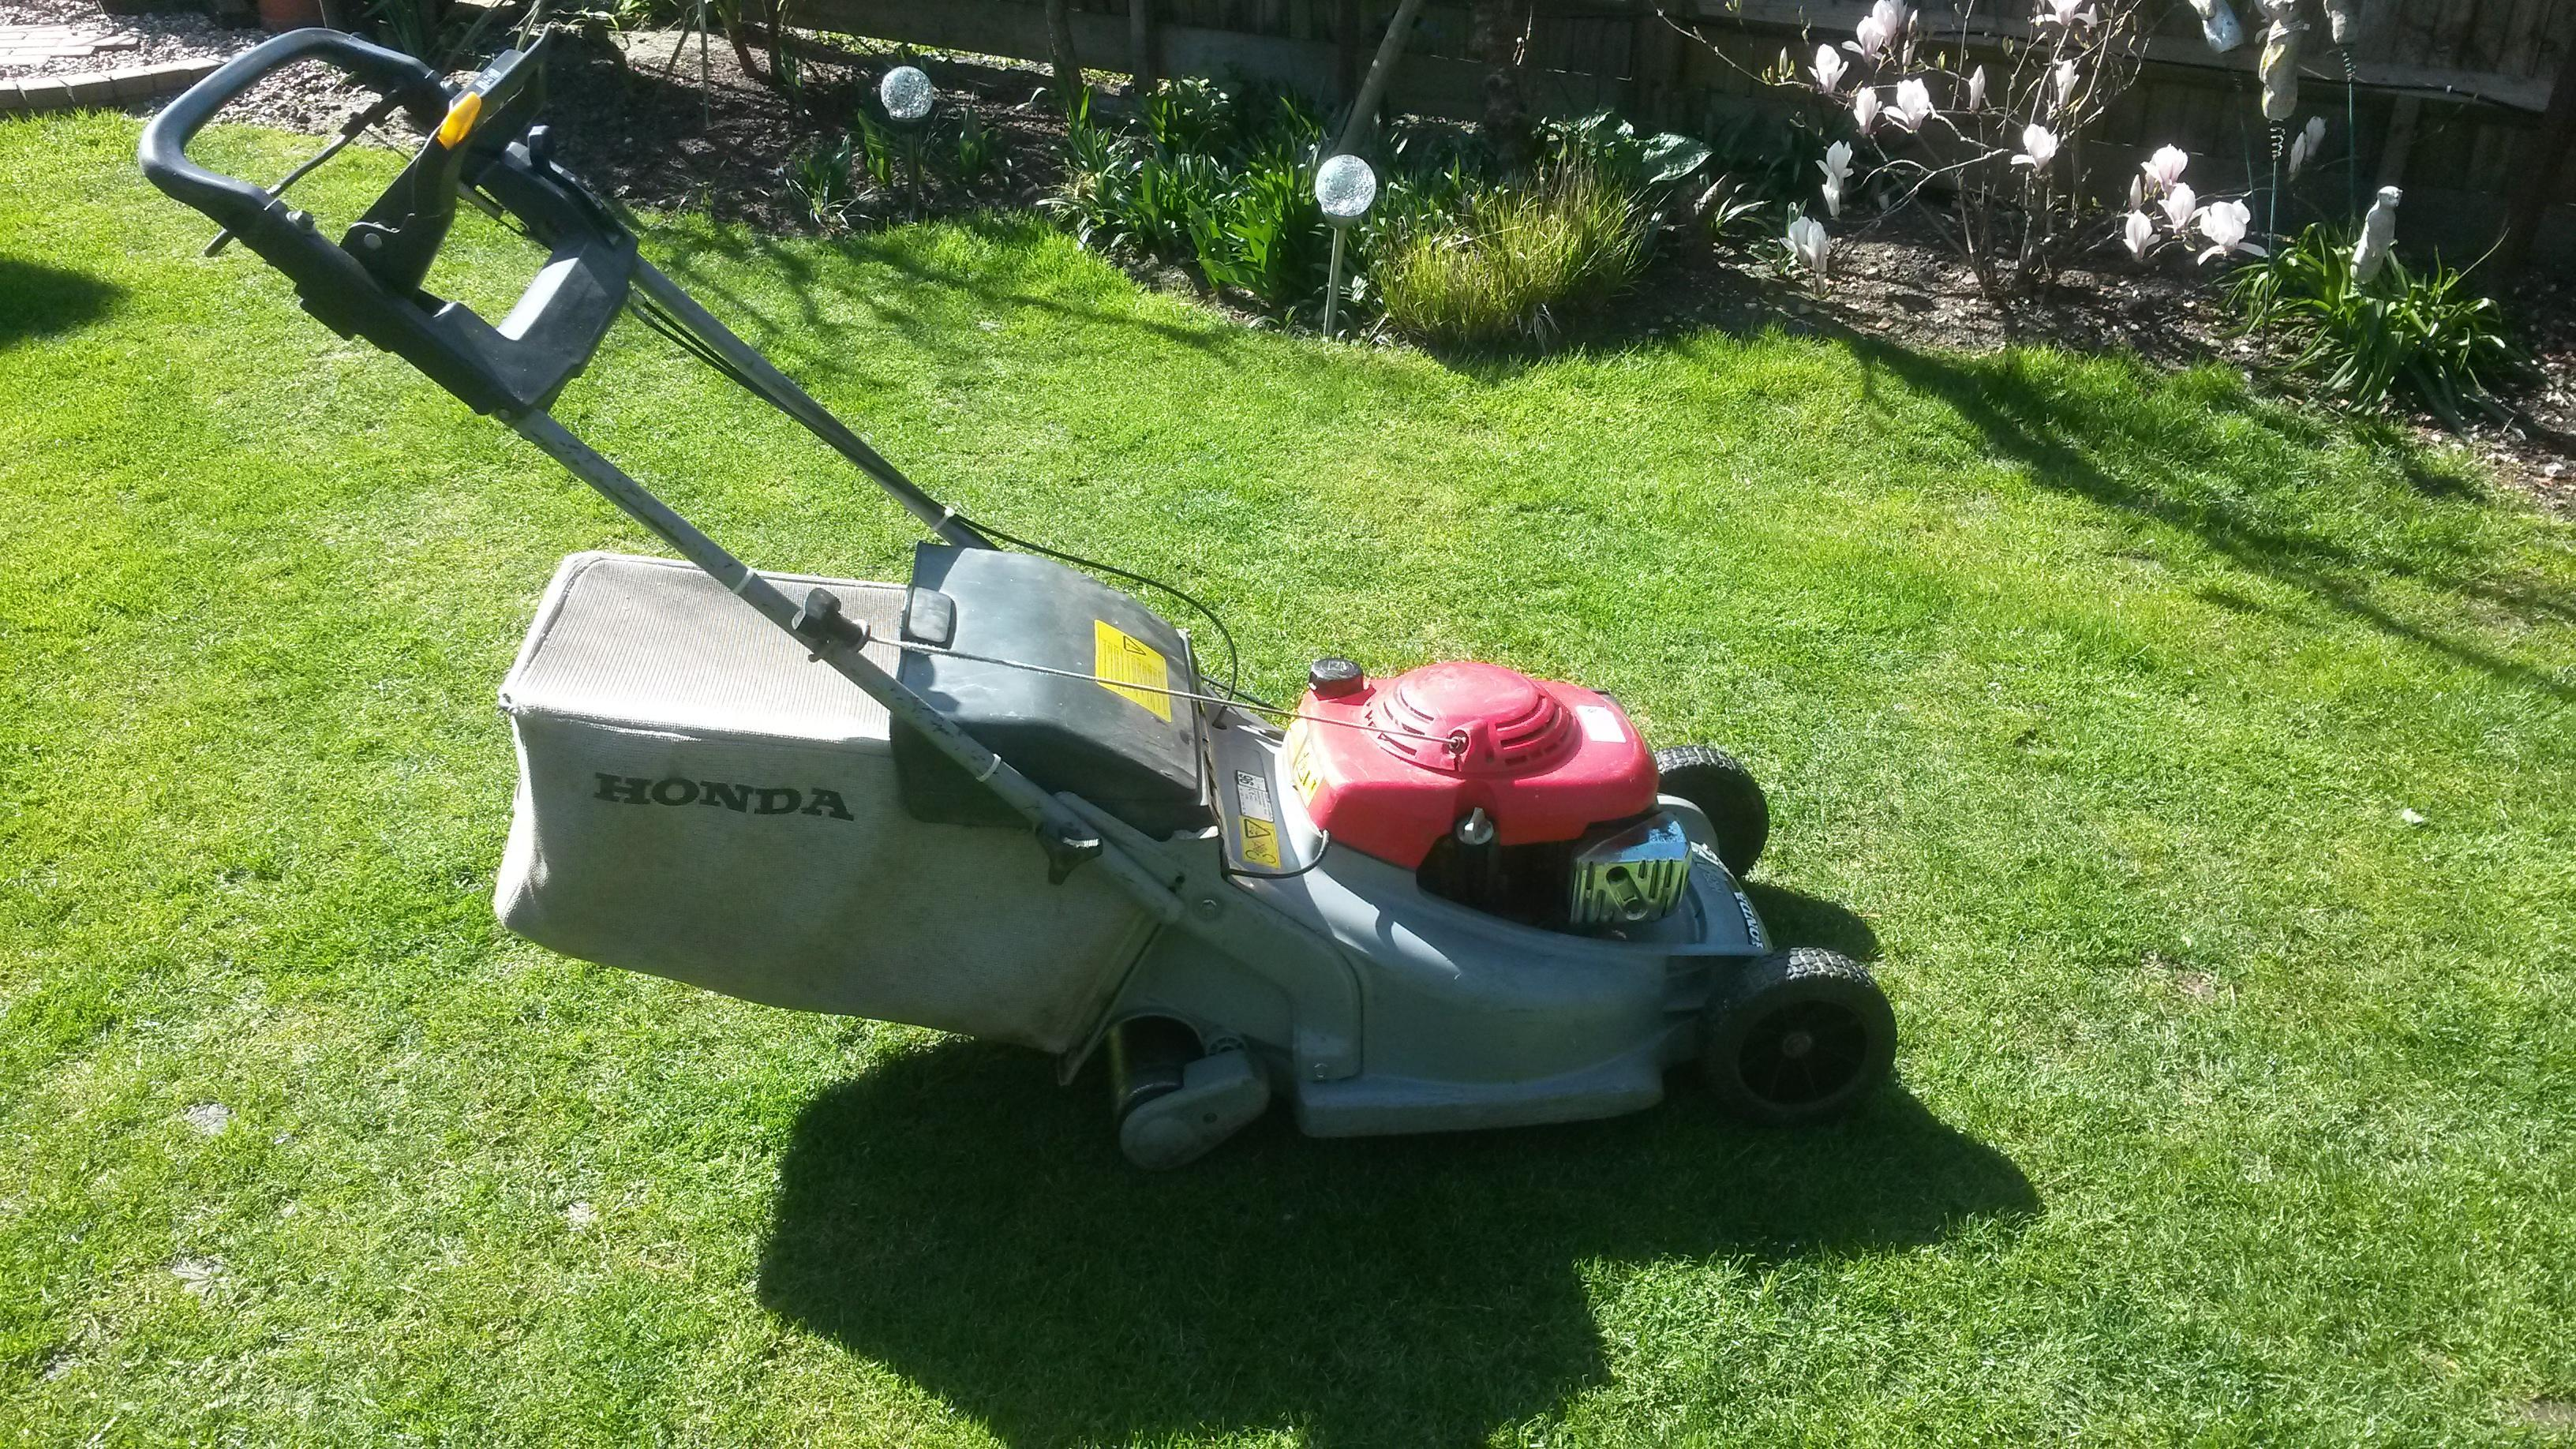 Honda HRB475 lawn mower